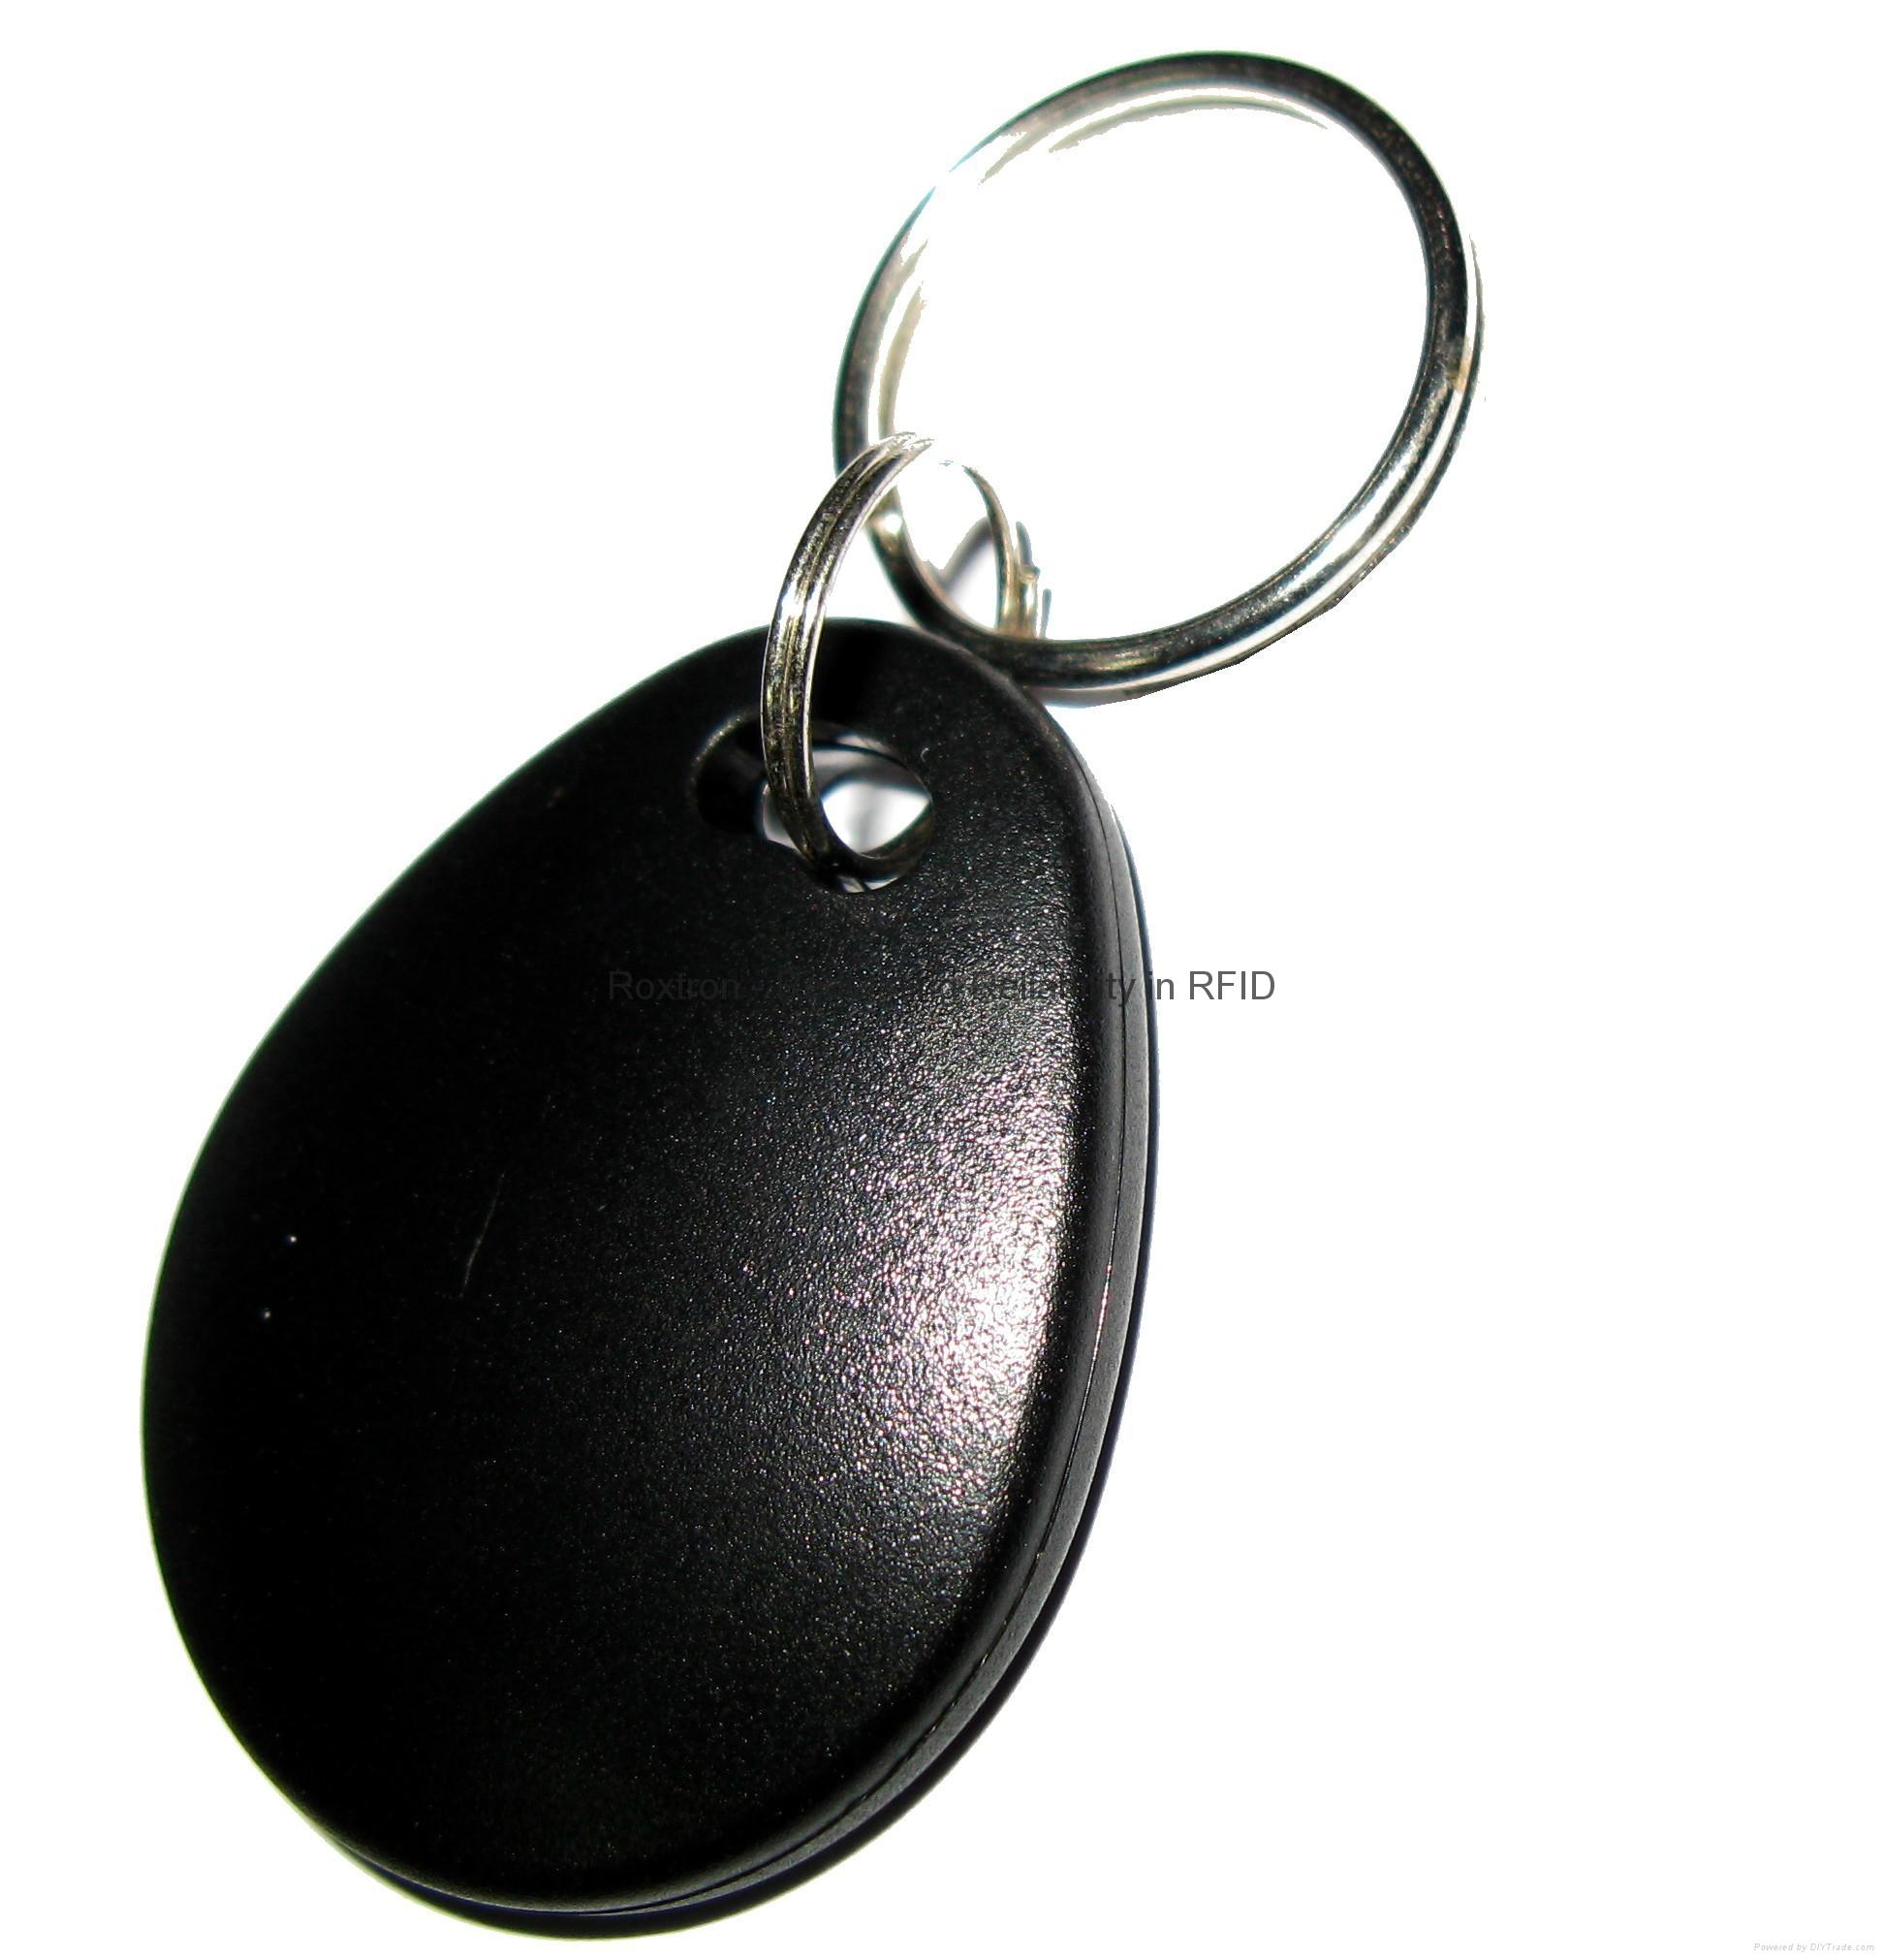 T5577 RXK03 Key Fob 14